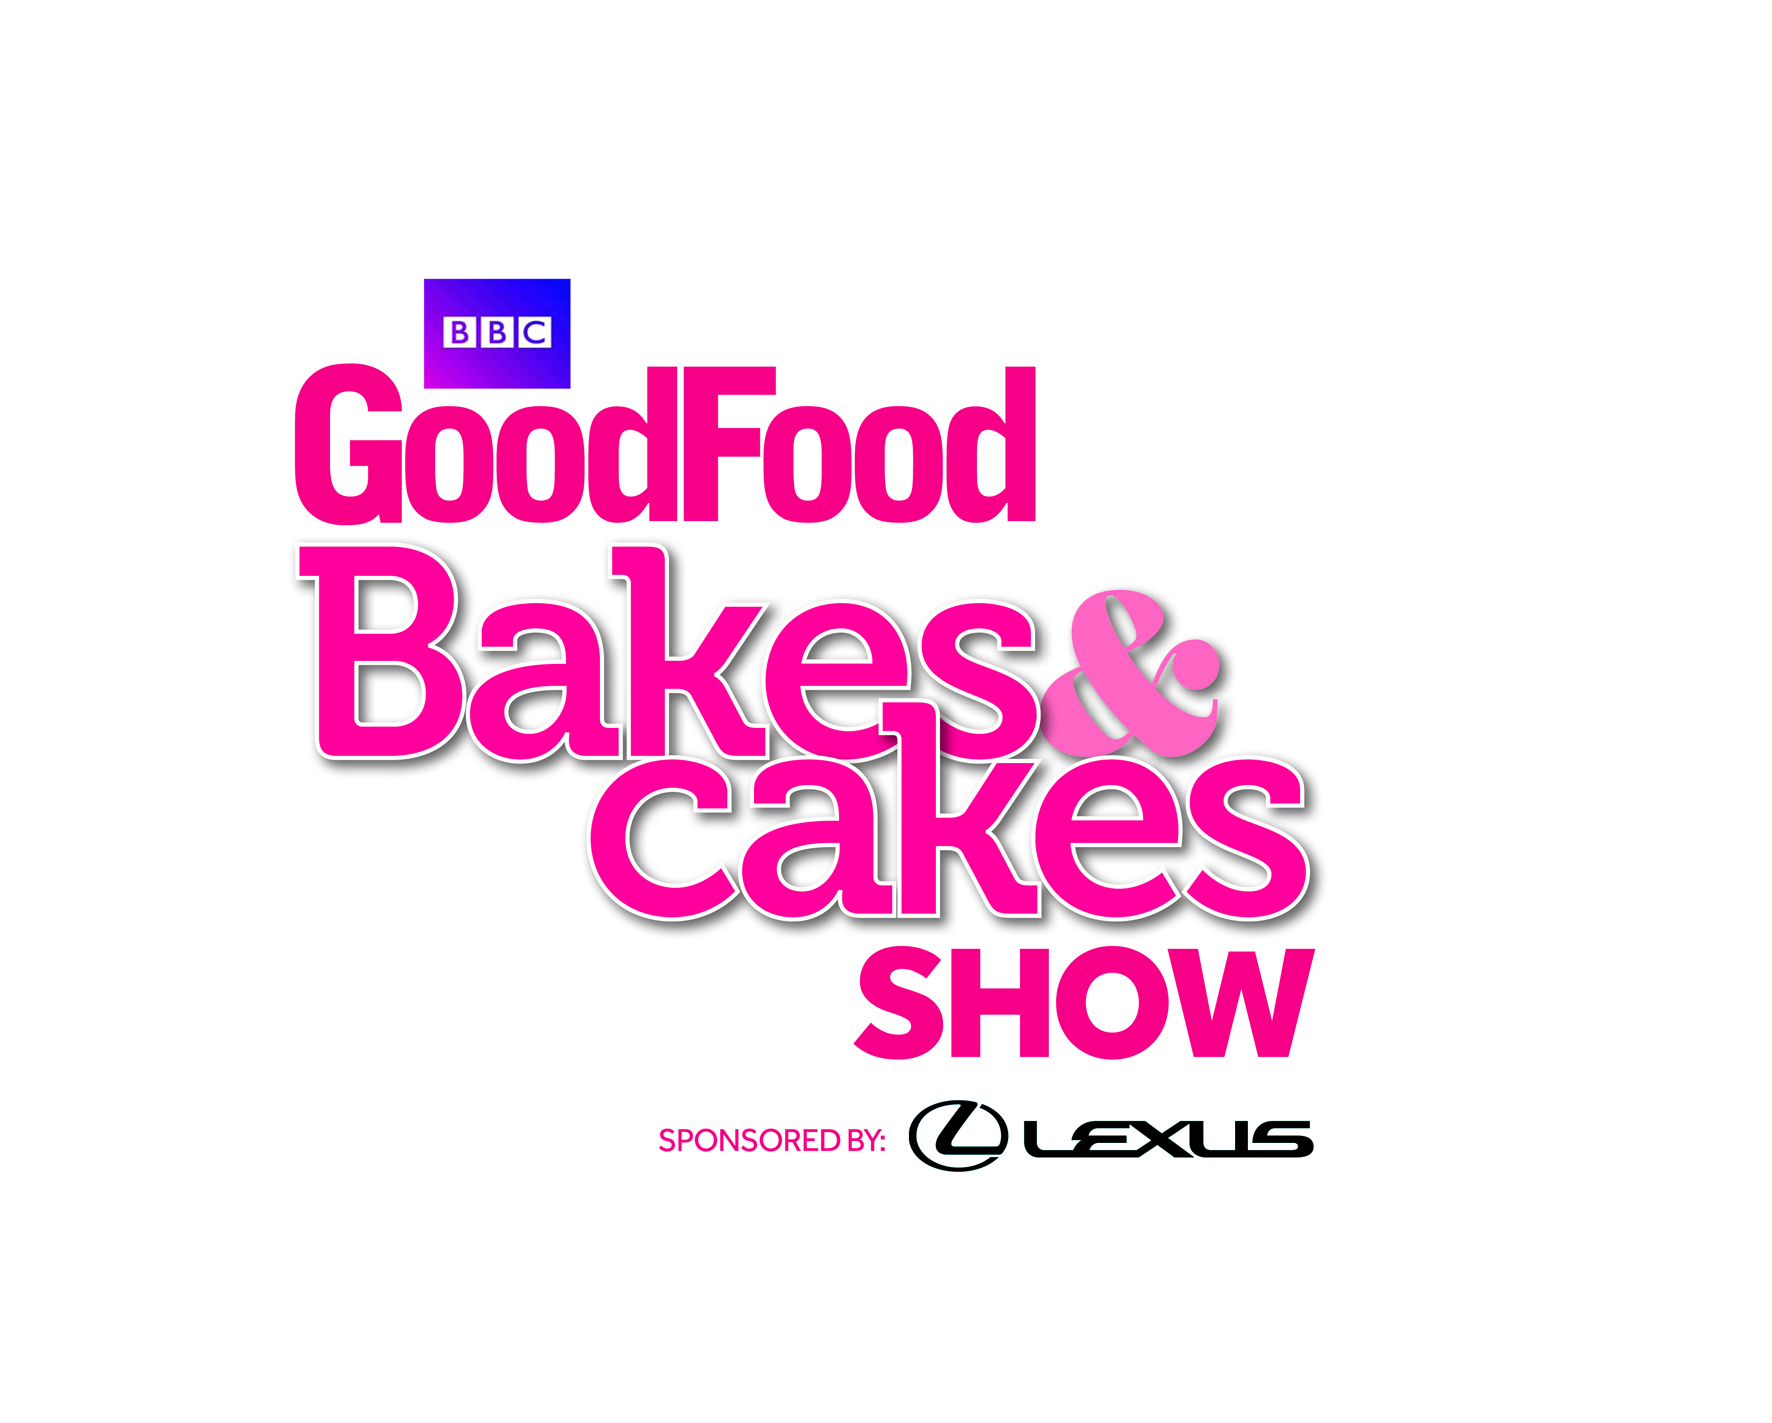 BBC Good Food Bakes & cakes